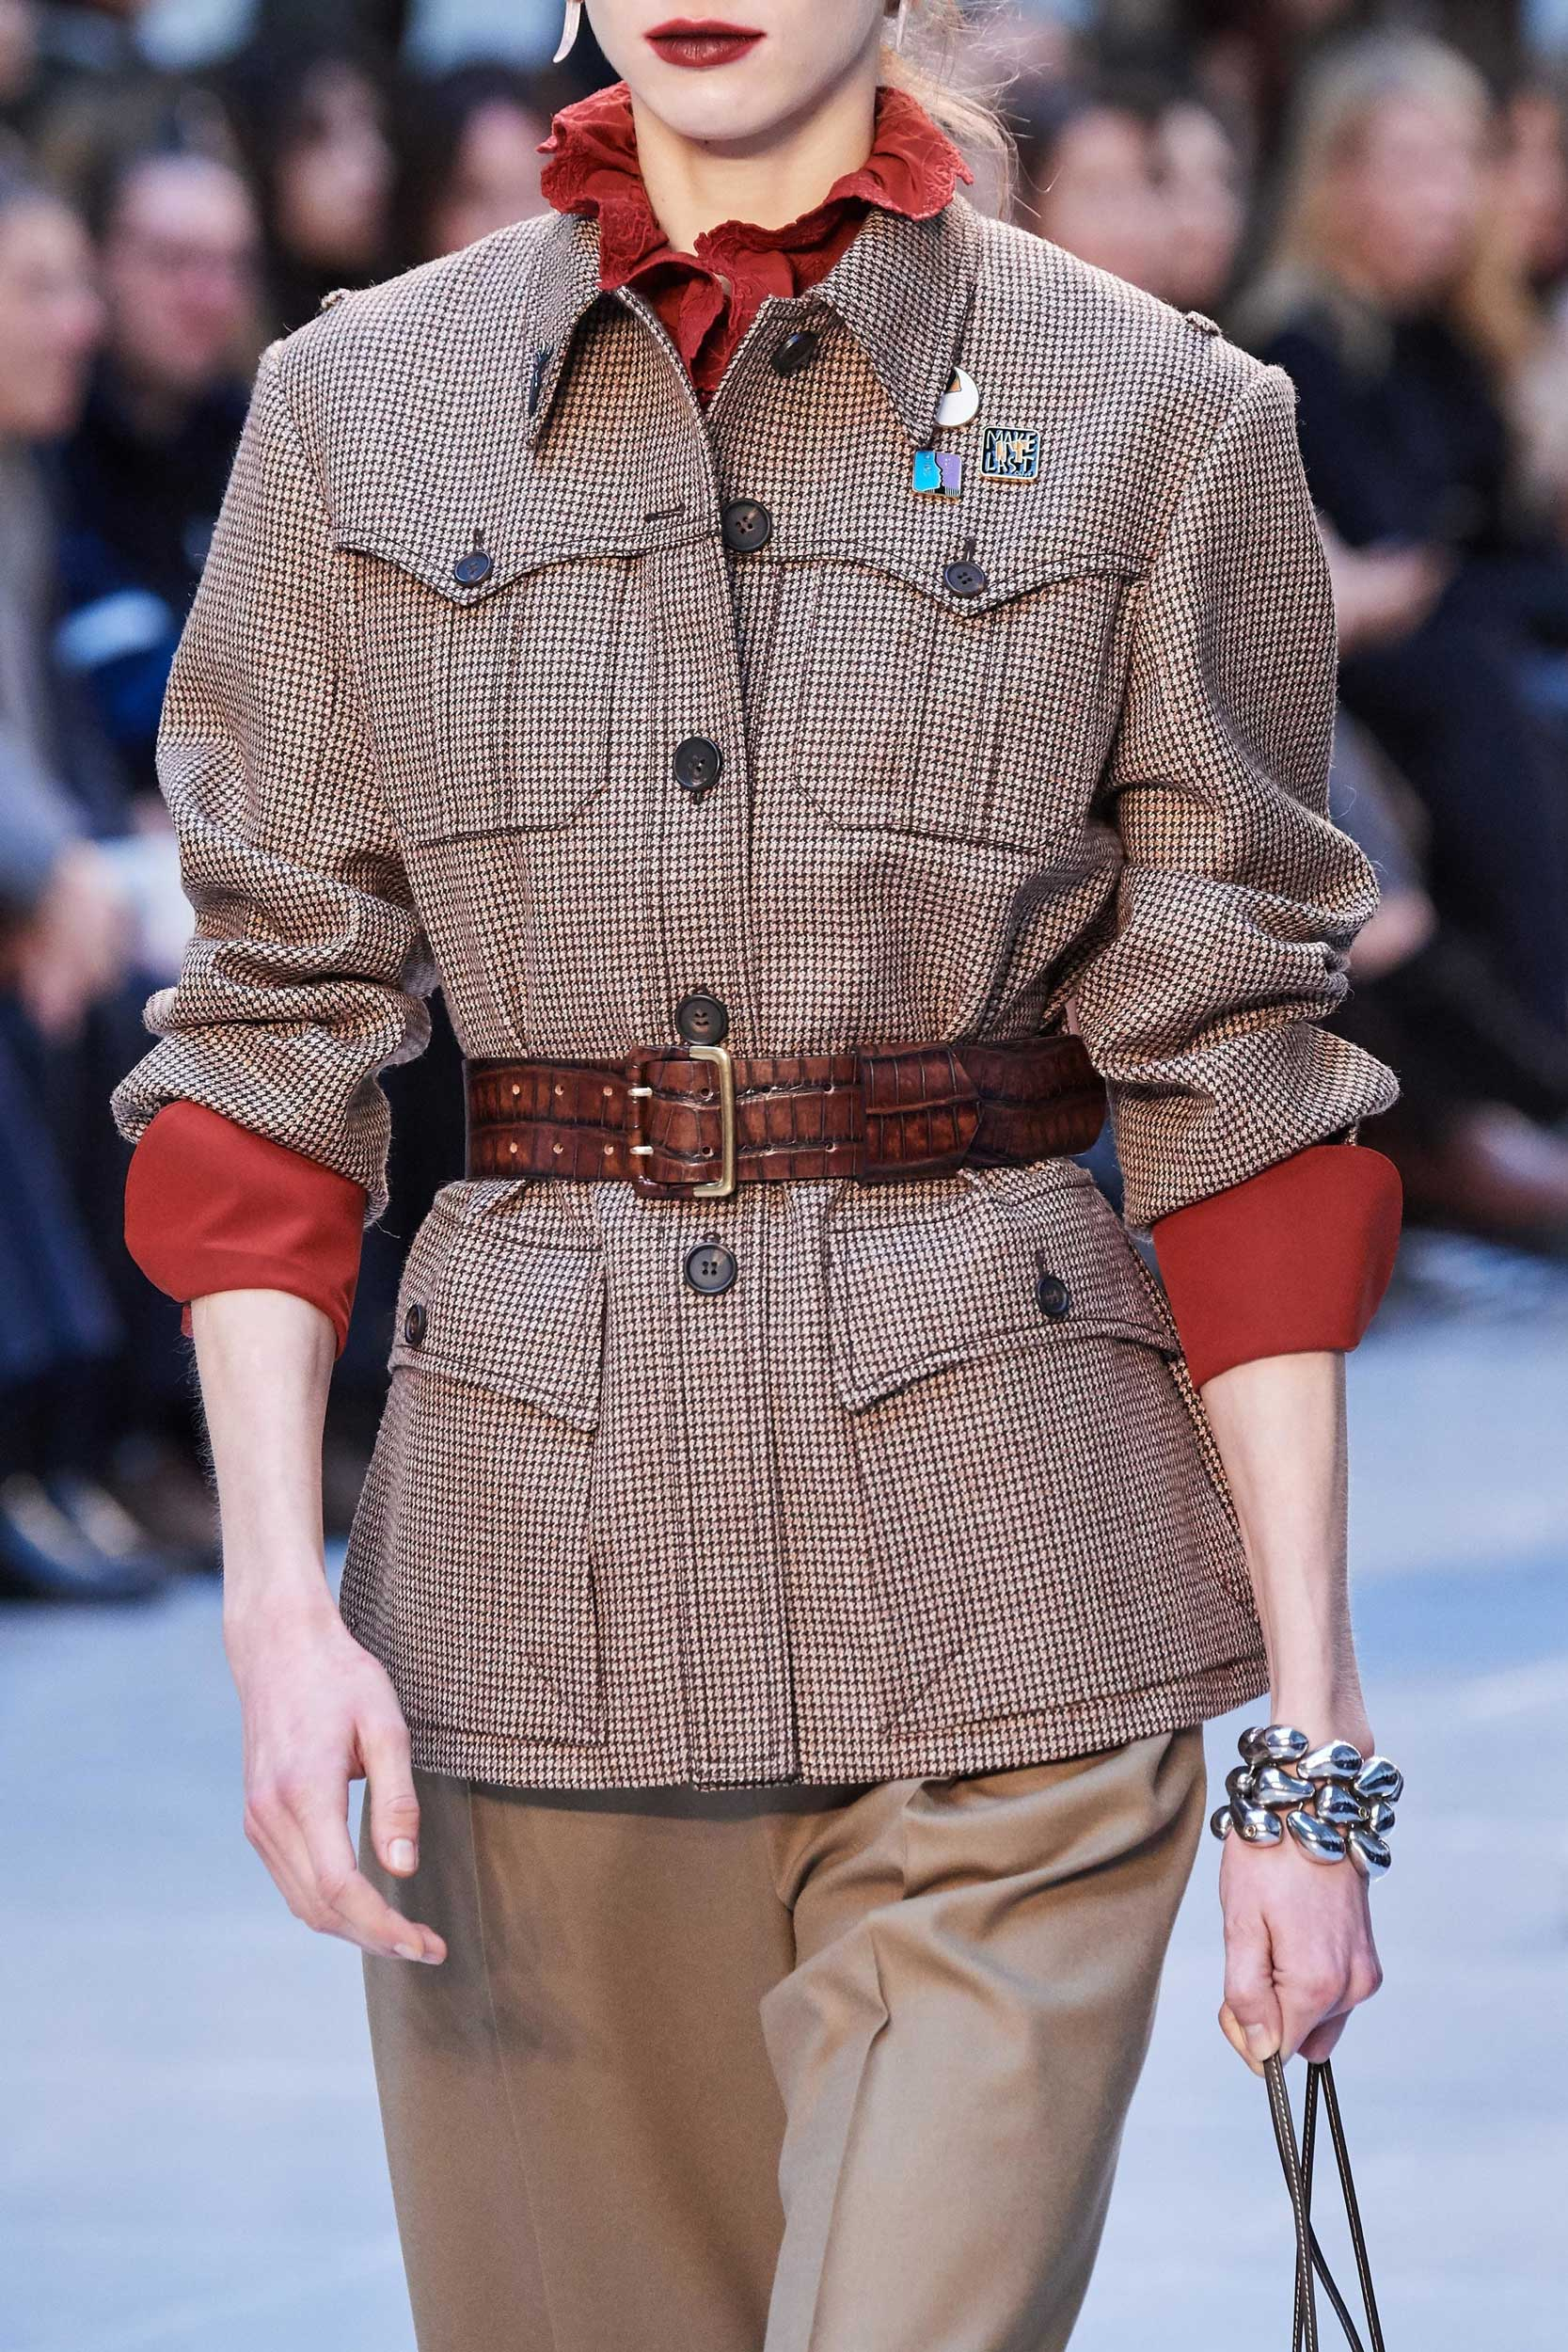 Chloe-Fall-Winter-2020-trends-runway-coverage-Ready-To-Wear-Vogue-details-lipsticks best of beauty wine lips fall 2020 trends